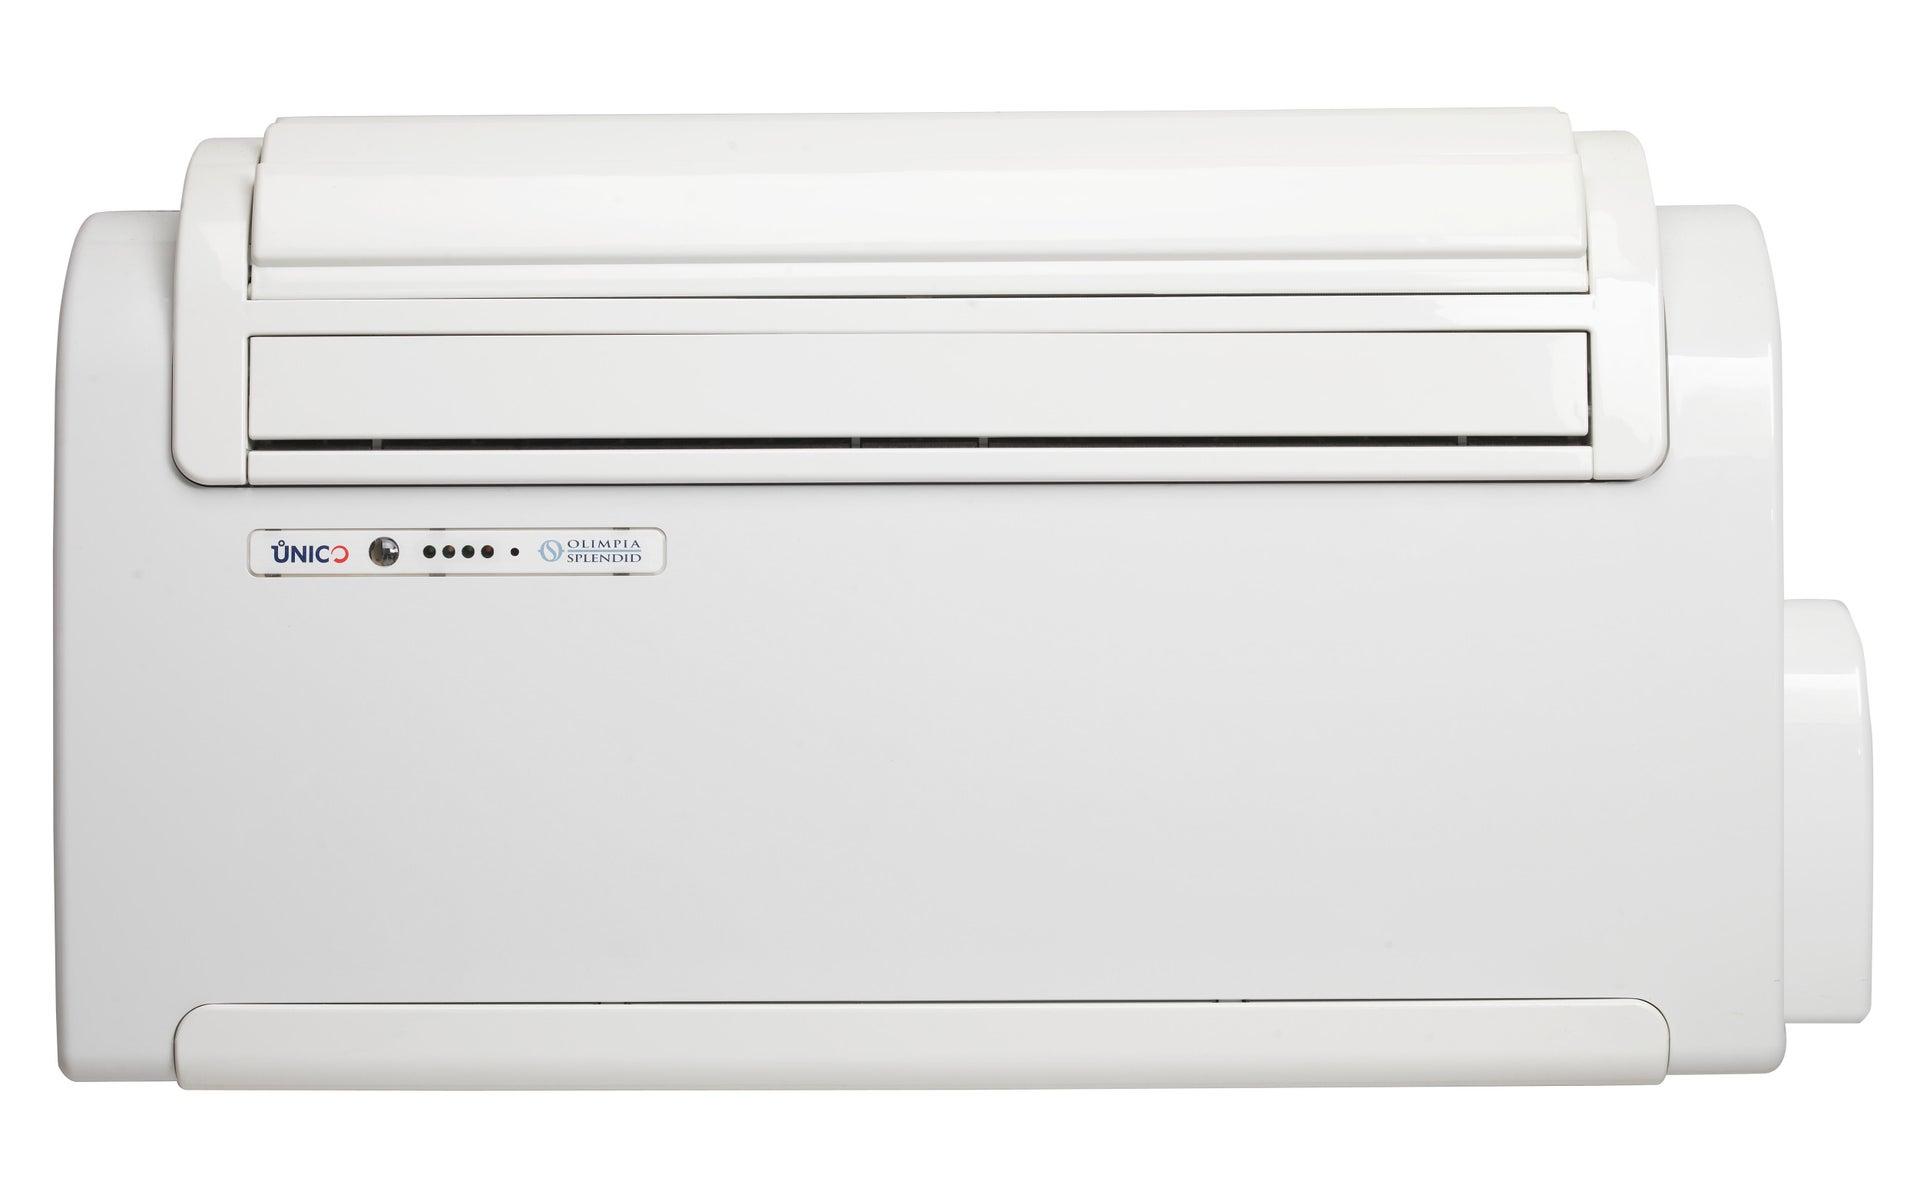 Climatizzatore fisso dualsplit OLIMPIA SPLENDID Unico Master 9000 BTU - 4